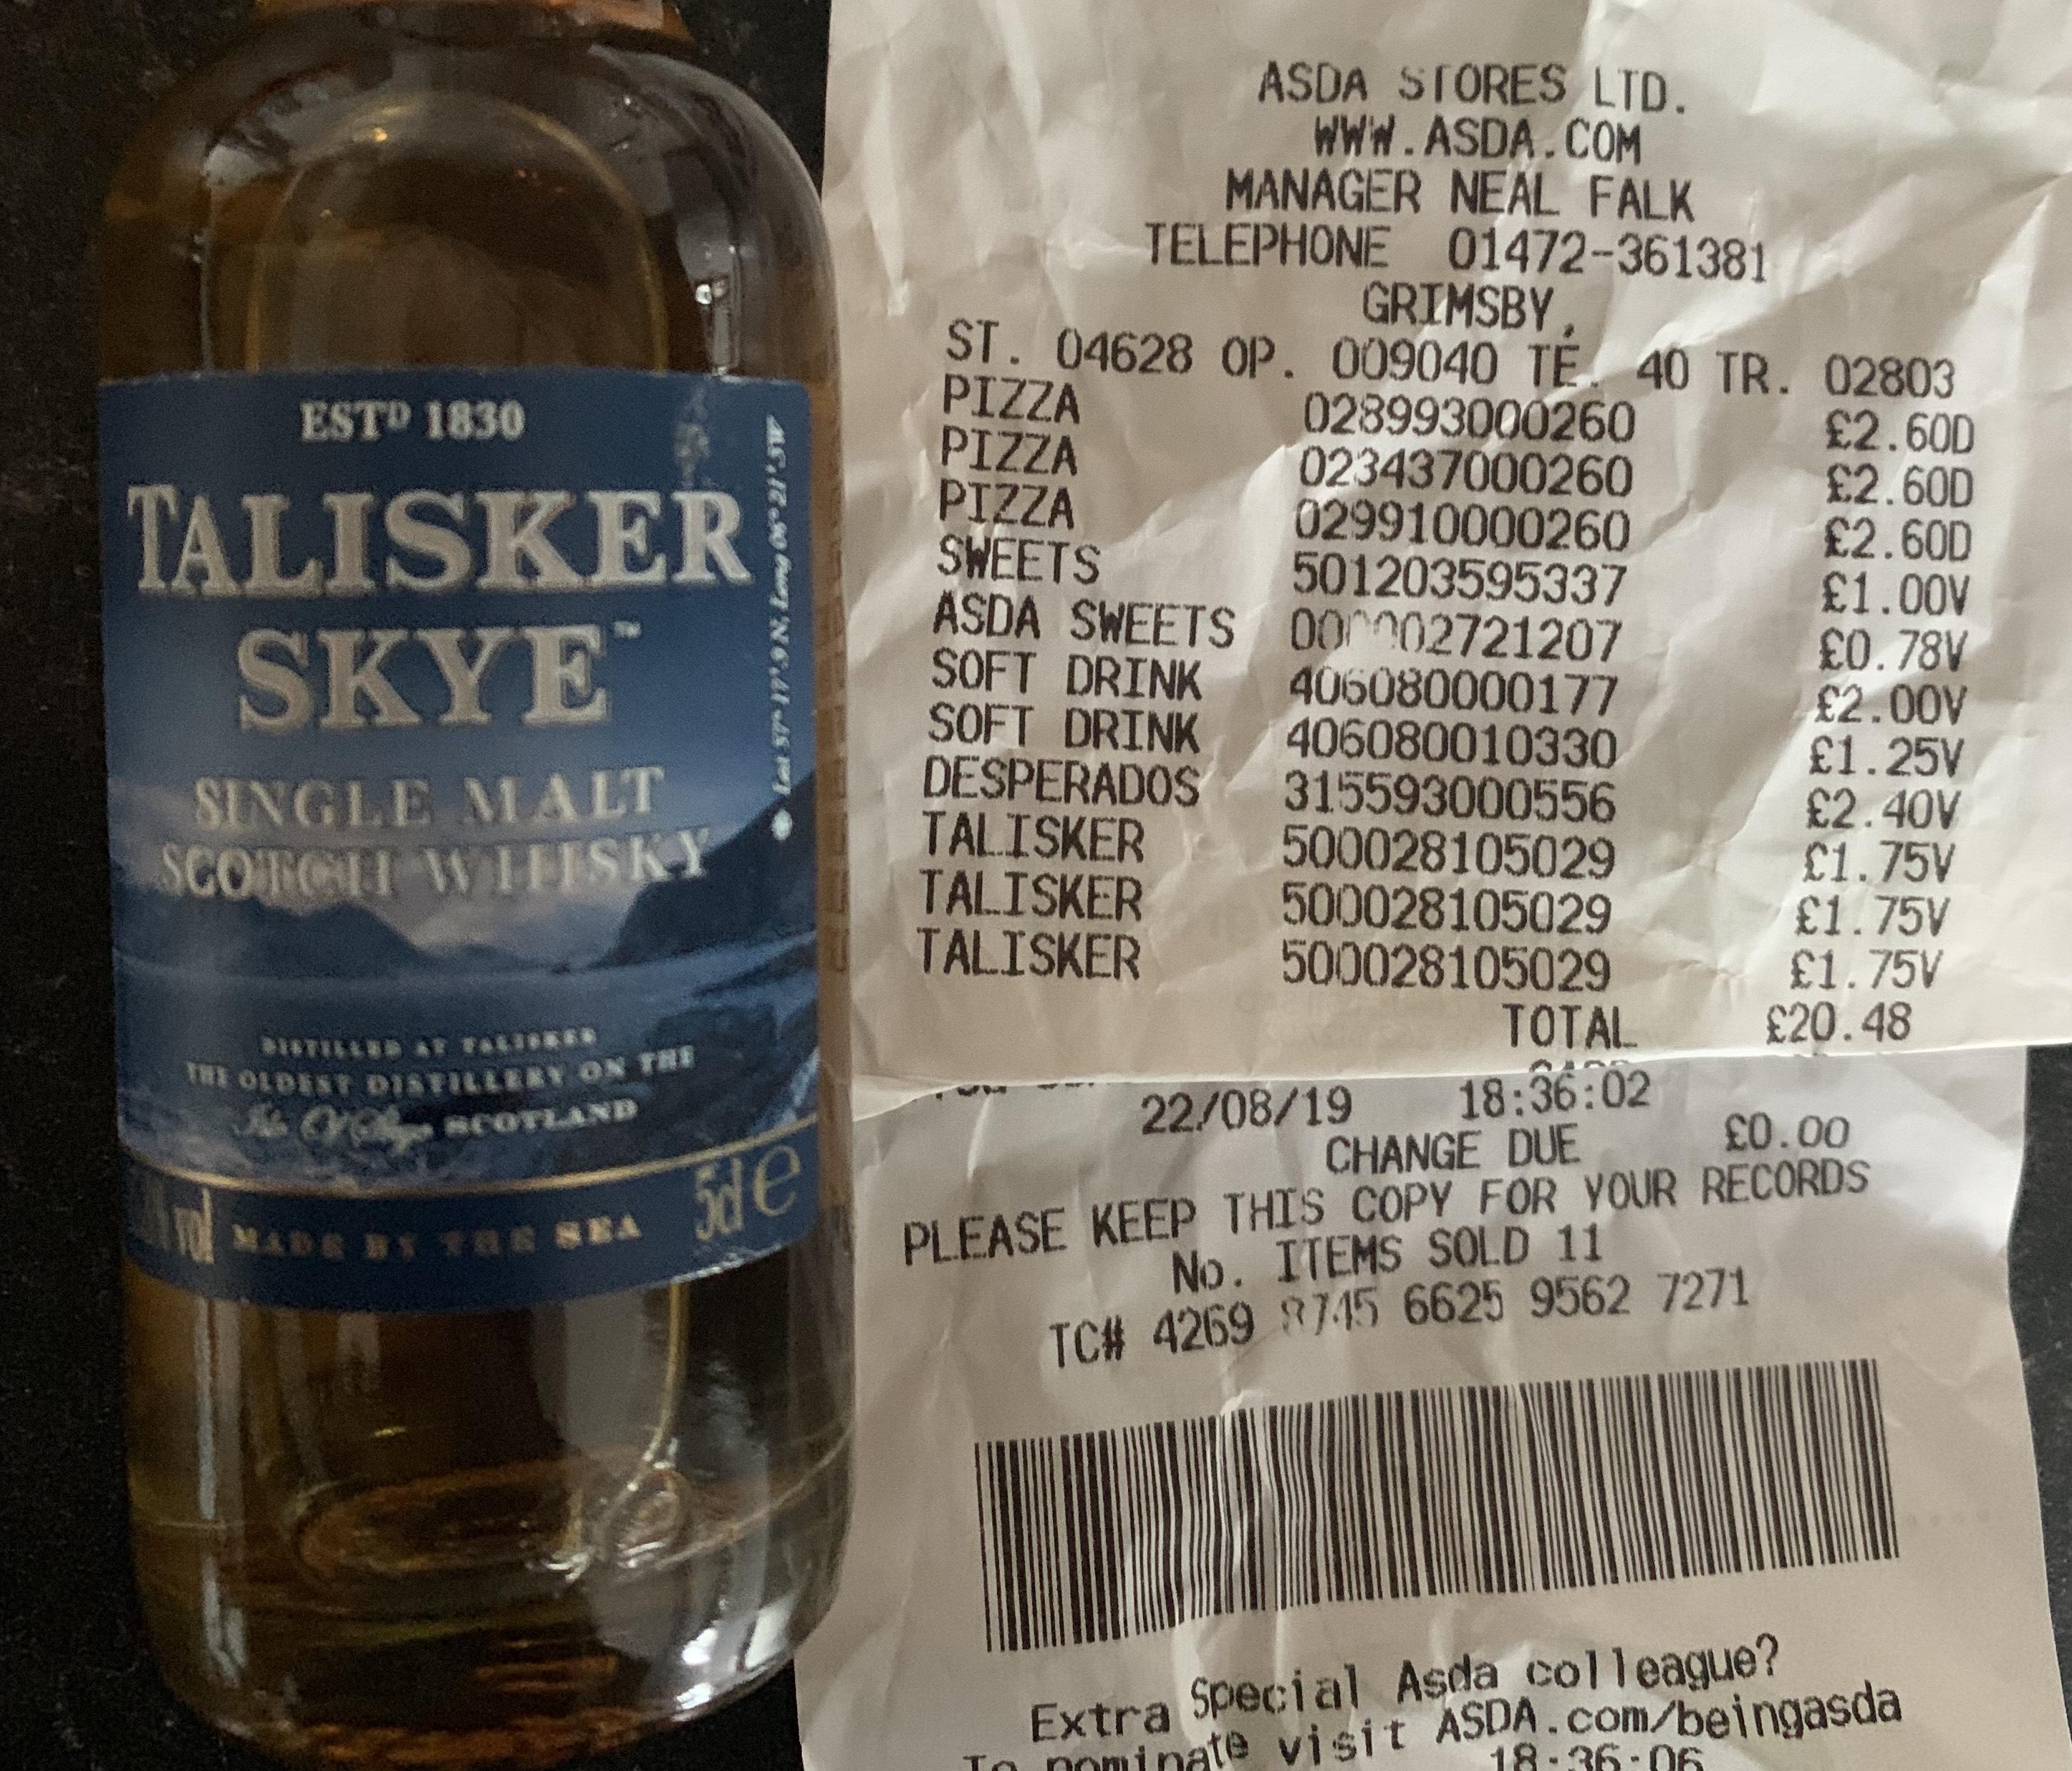 Talisker Skye - Single Malt Whisky 5cl £1.75 at Asda Grimsby